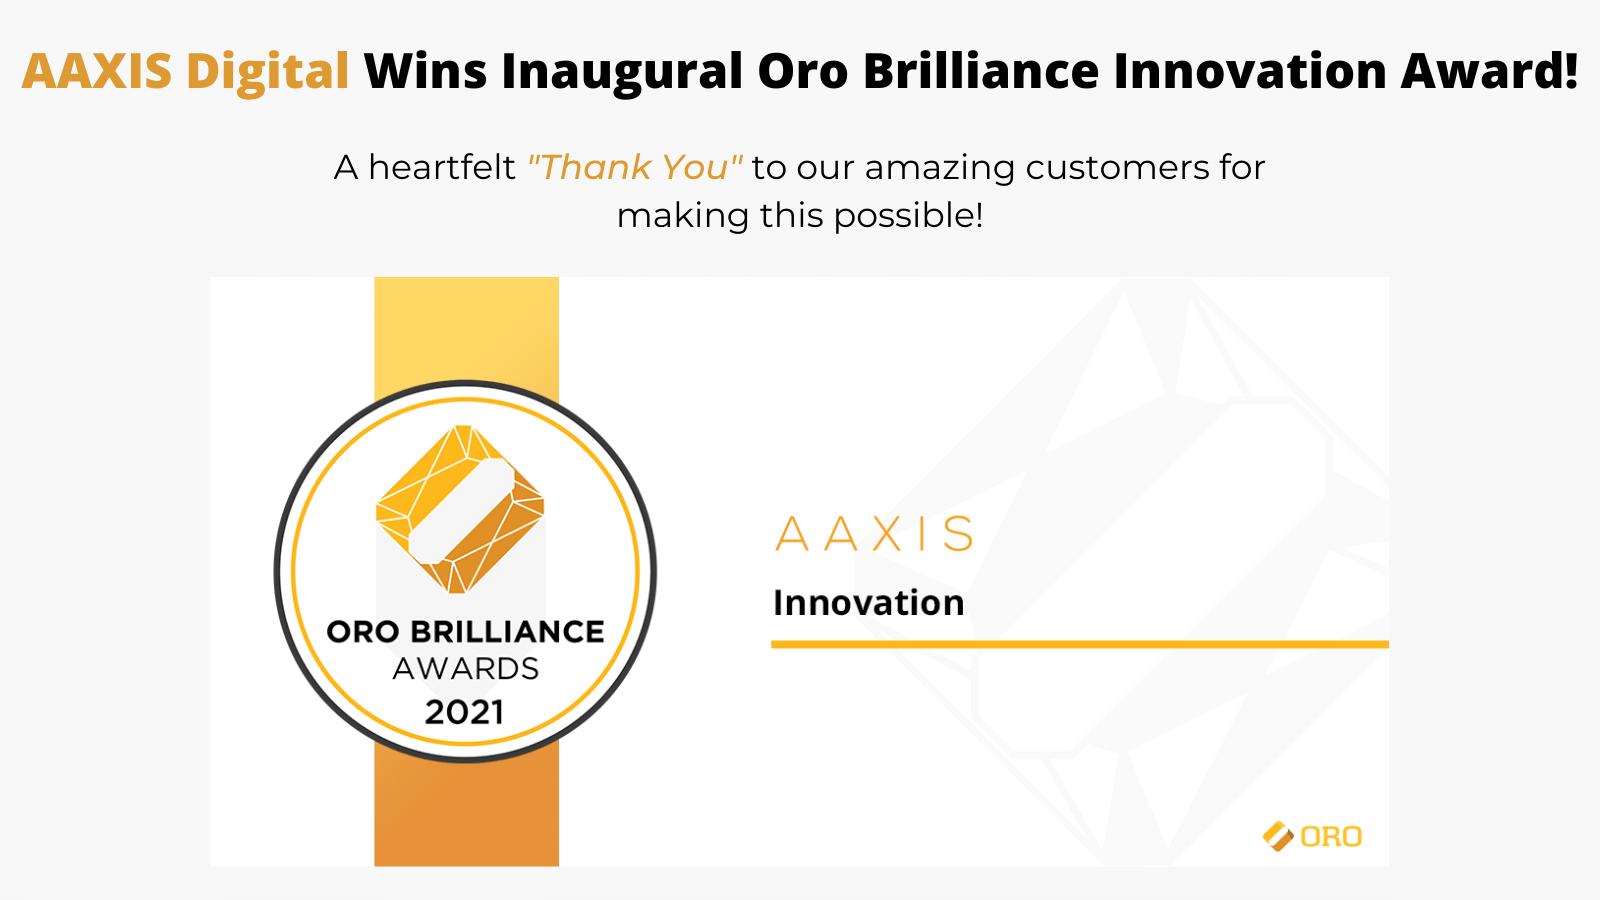 AAXIS Digital Wins Innovation Award at the Inaugural Oro Brilliance Awards